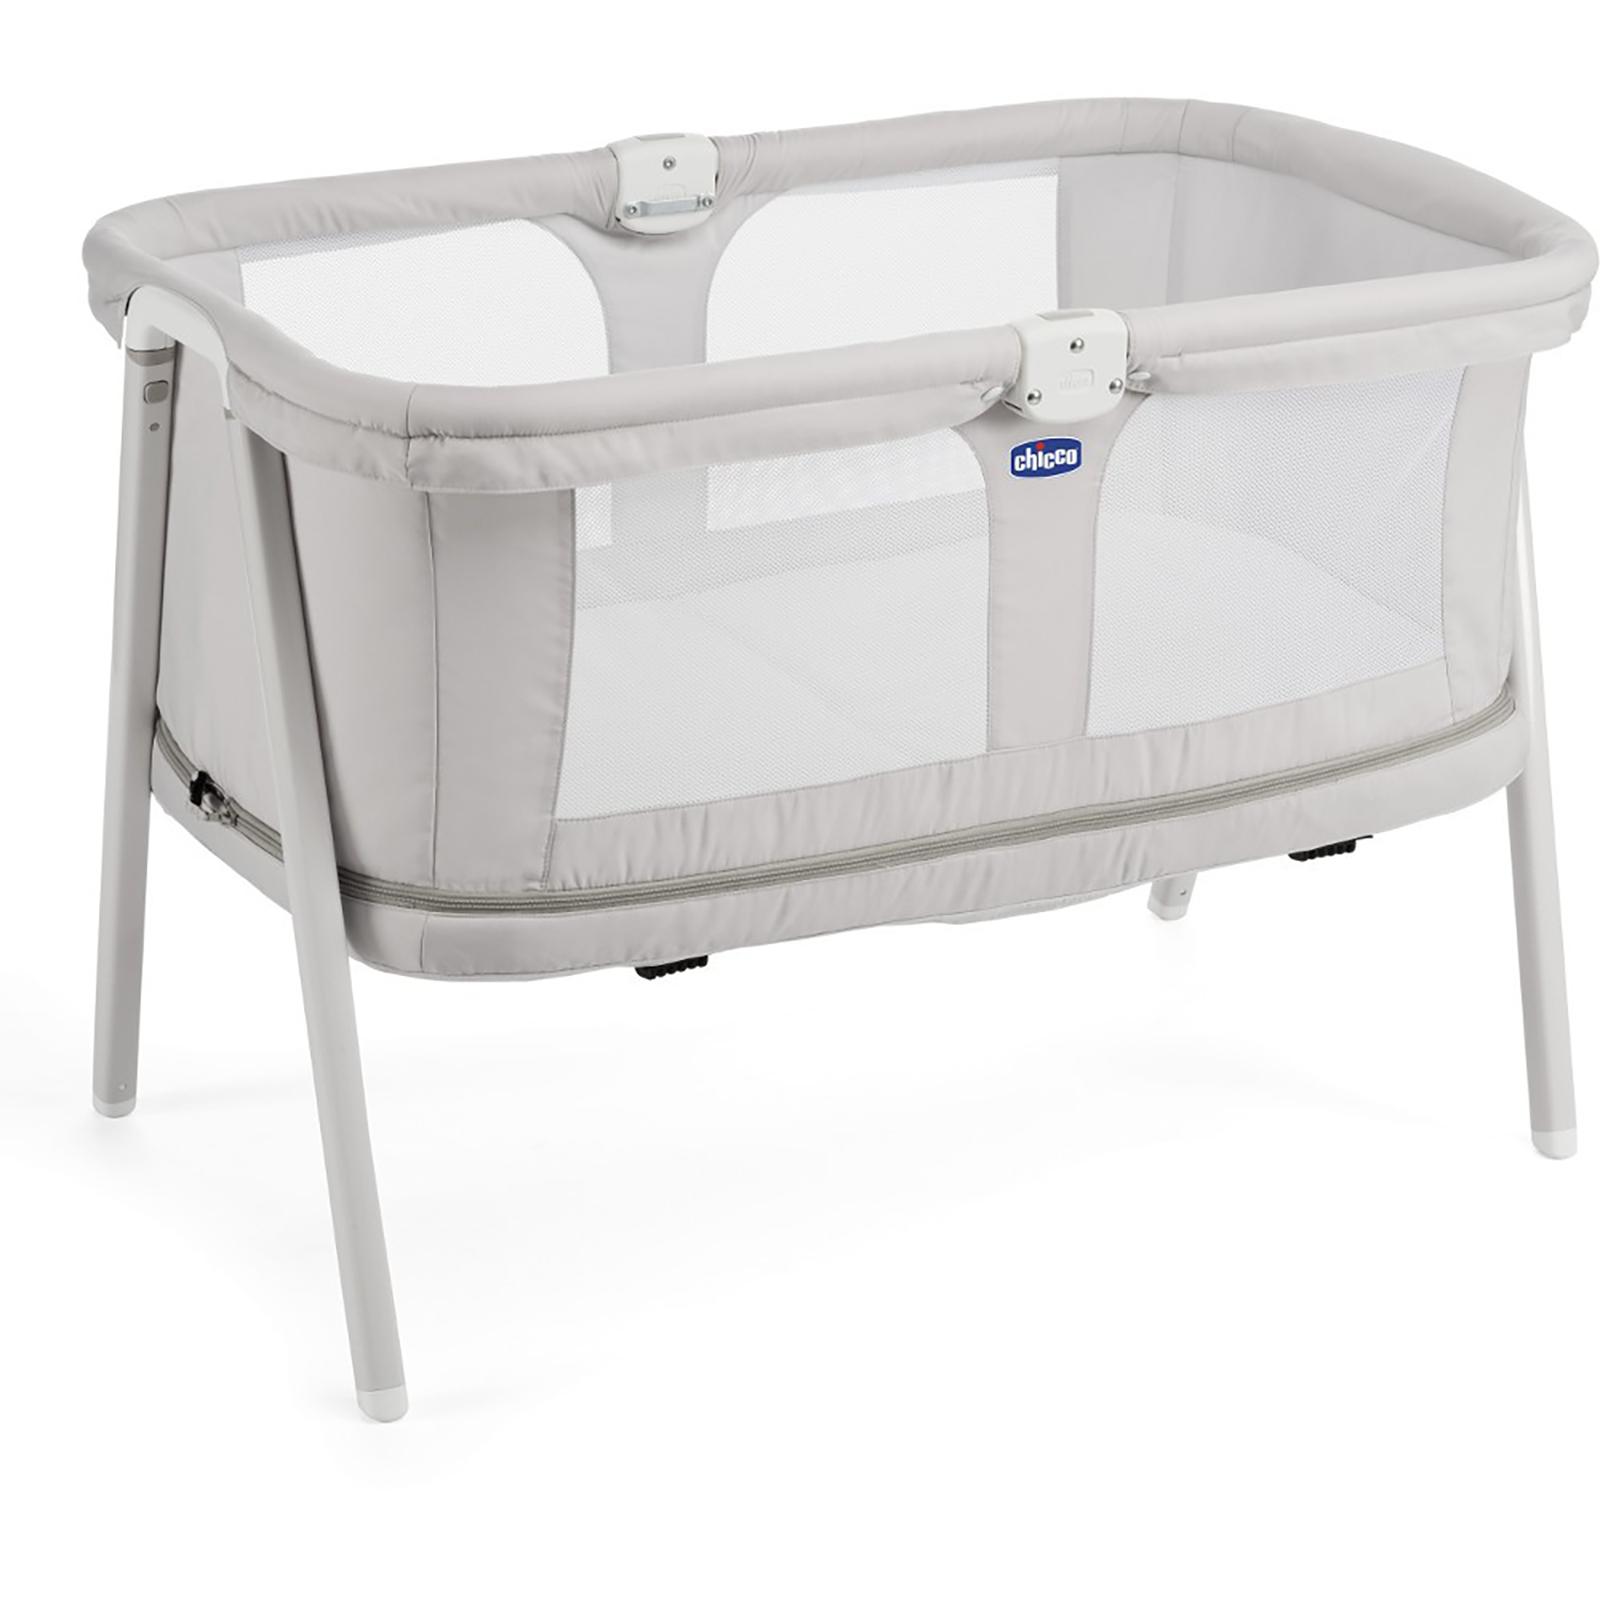 New Chicco Light Grey Lullago Zip Crib With Practical